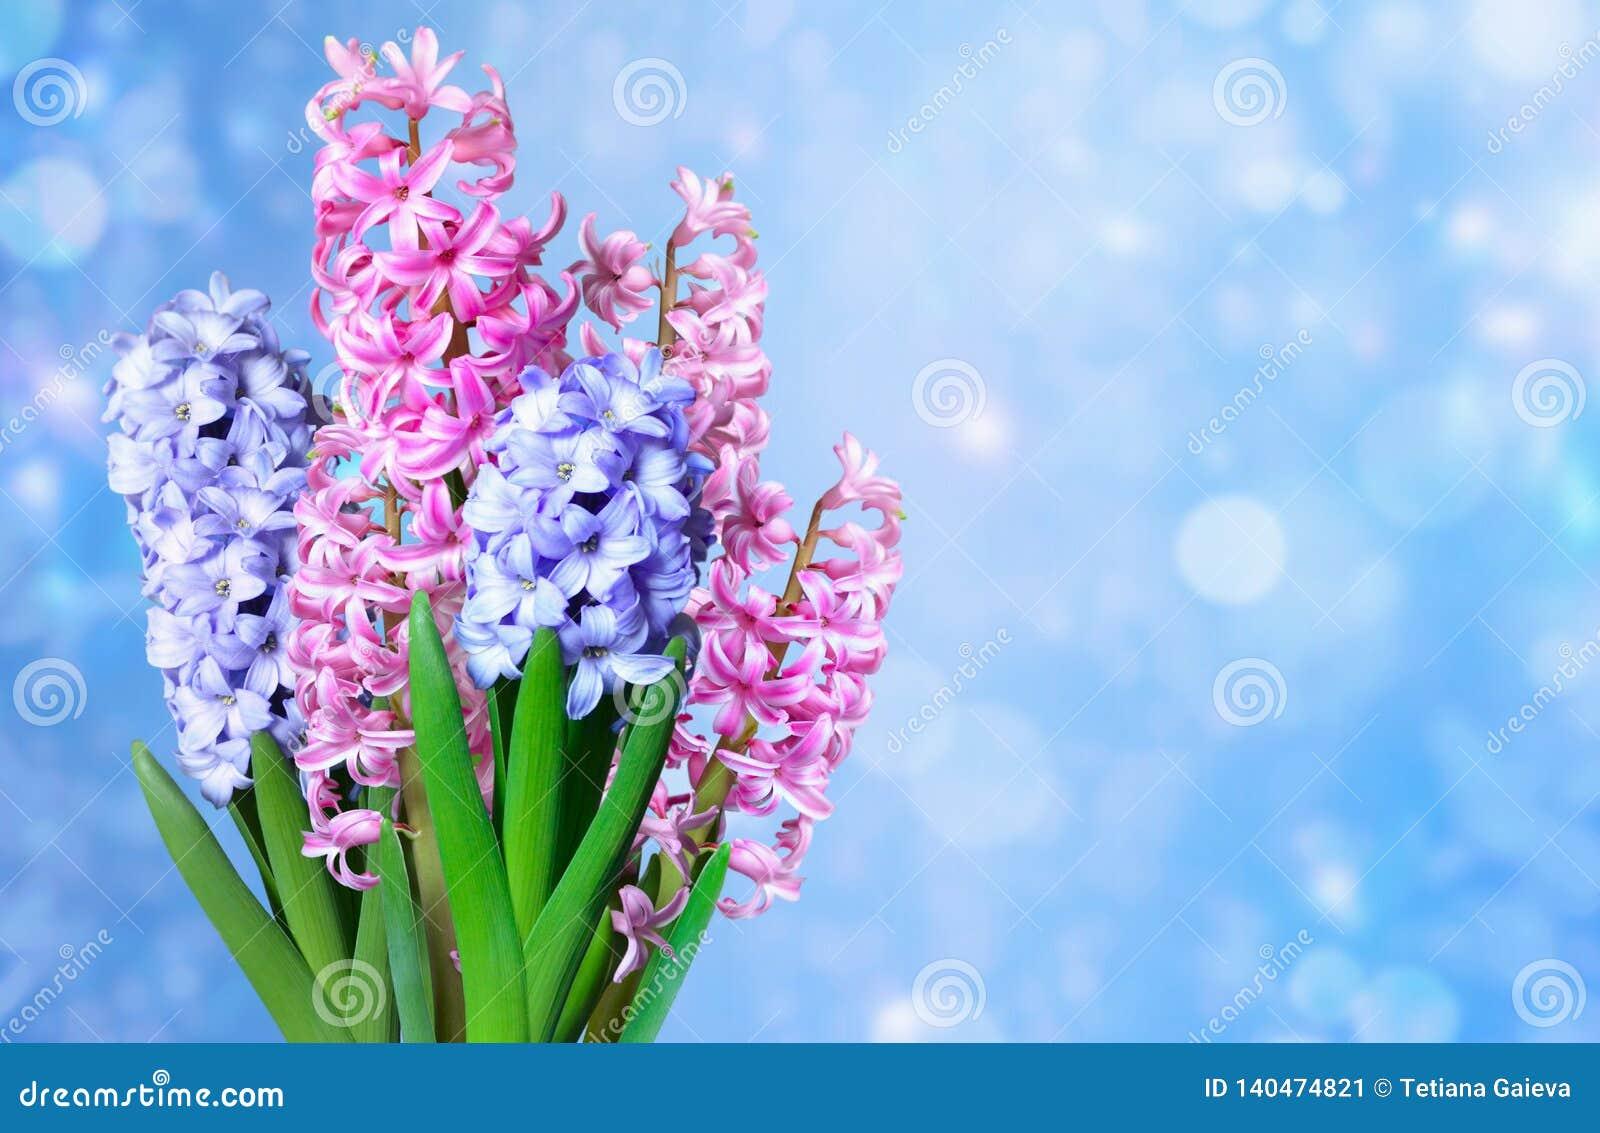 Hyacinths on a blurred blue background